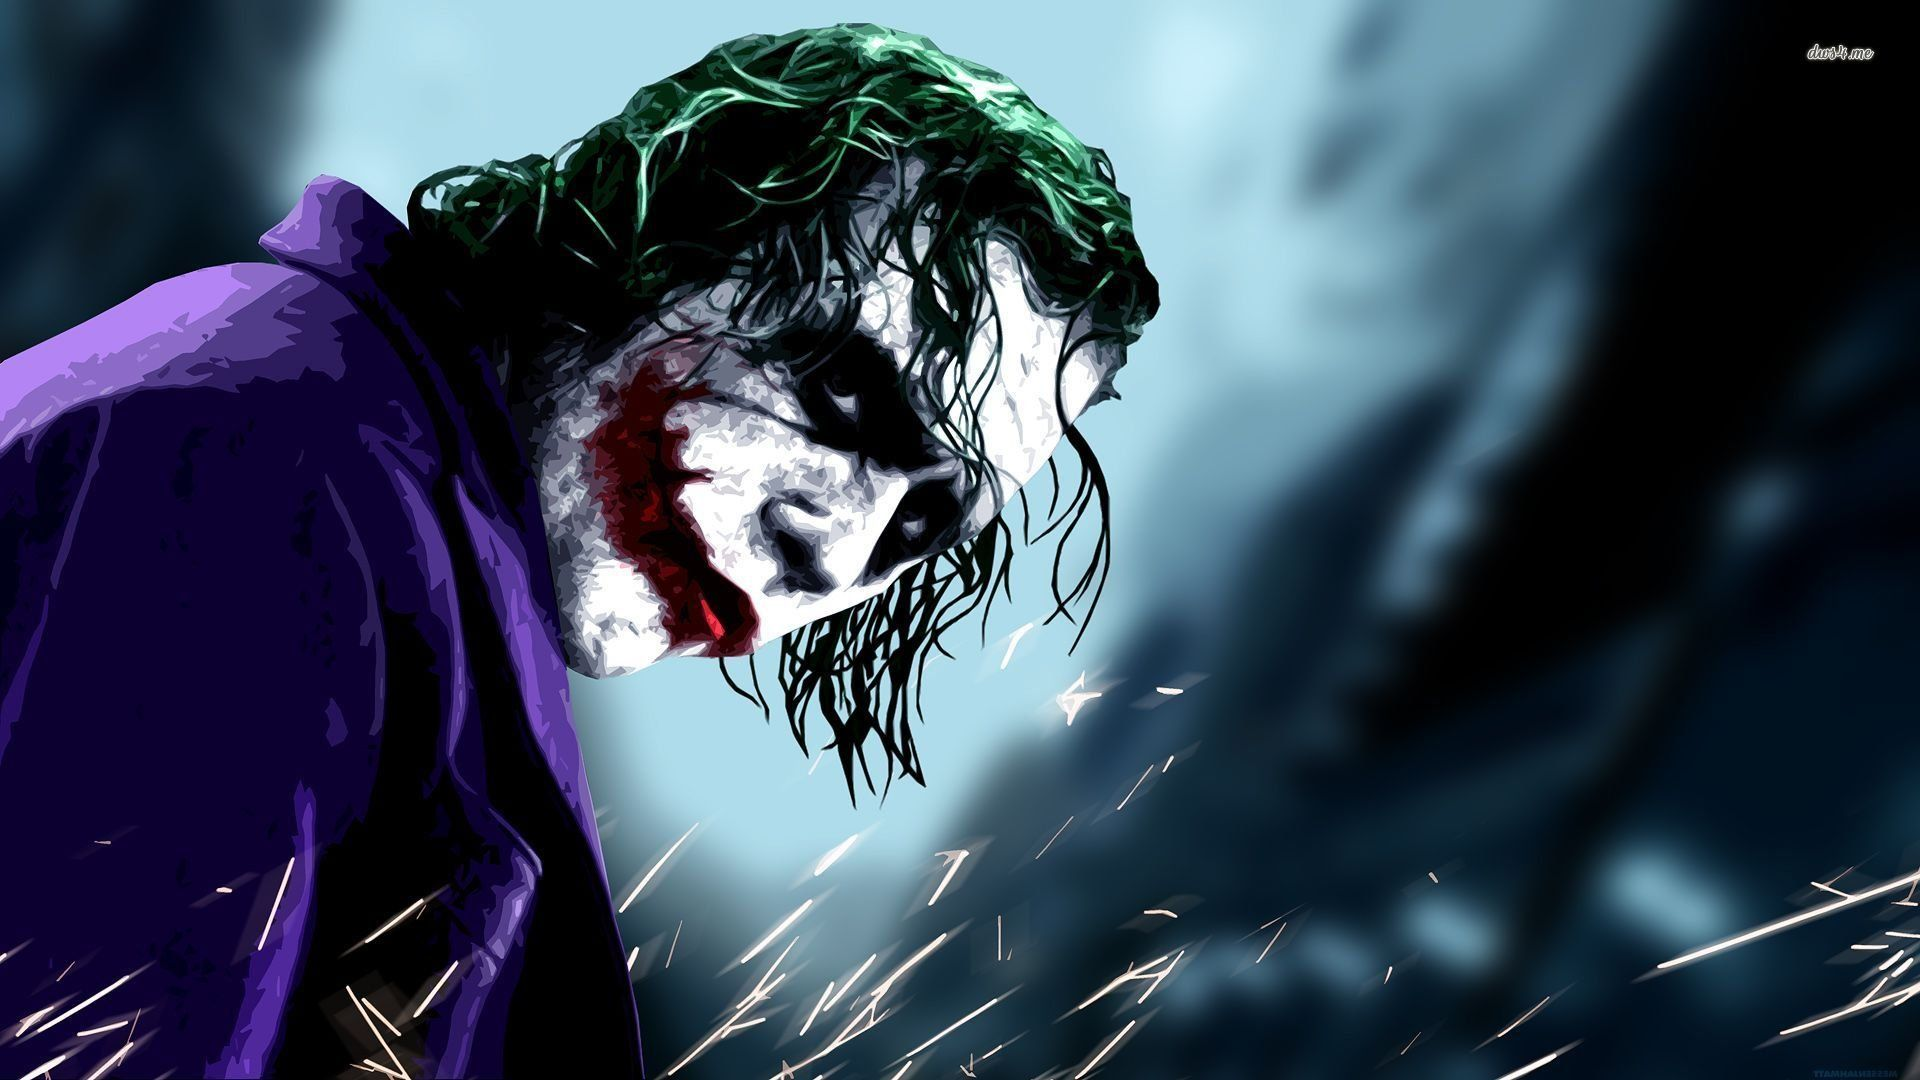 The Dark Knight Wallpapers 1920x1080 Joker 53